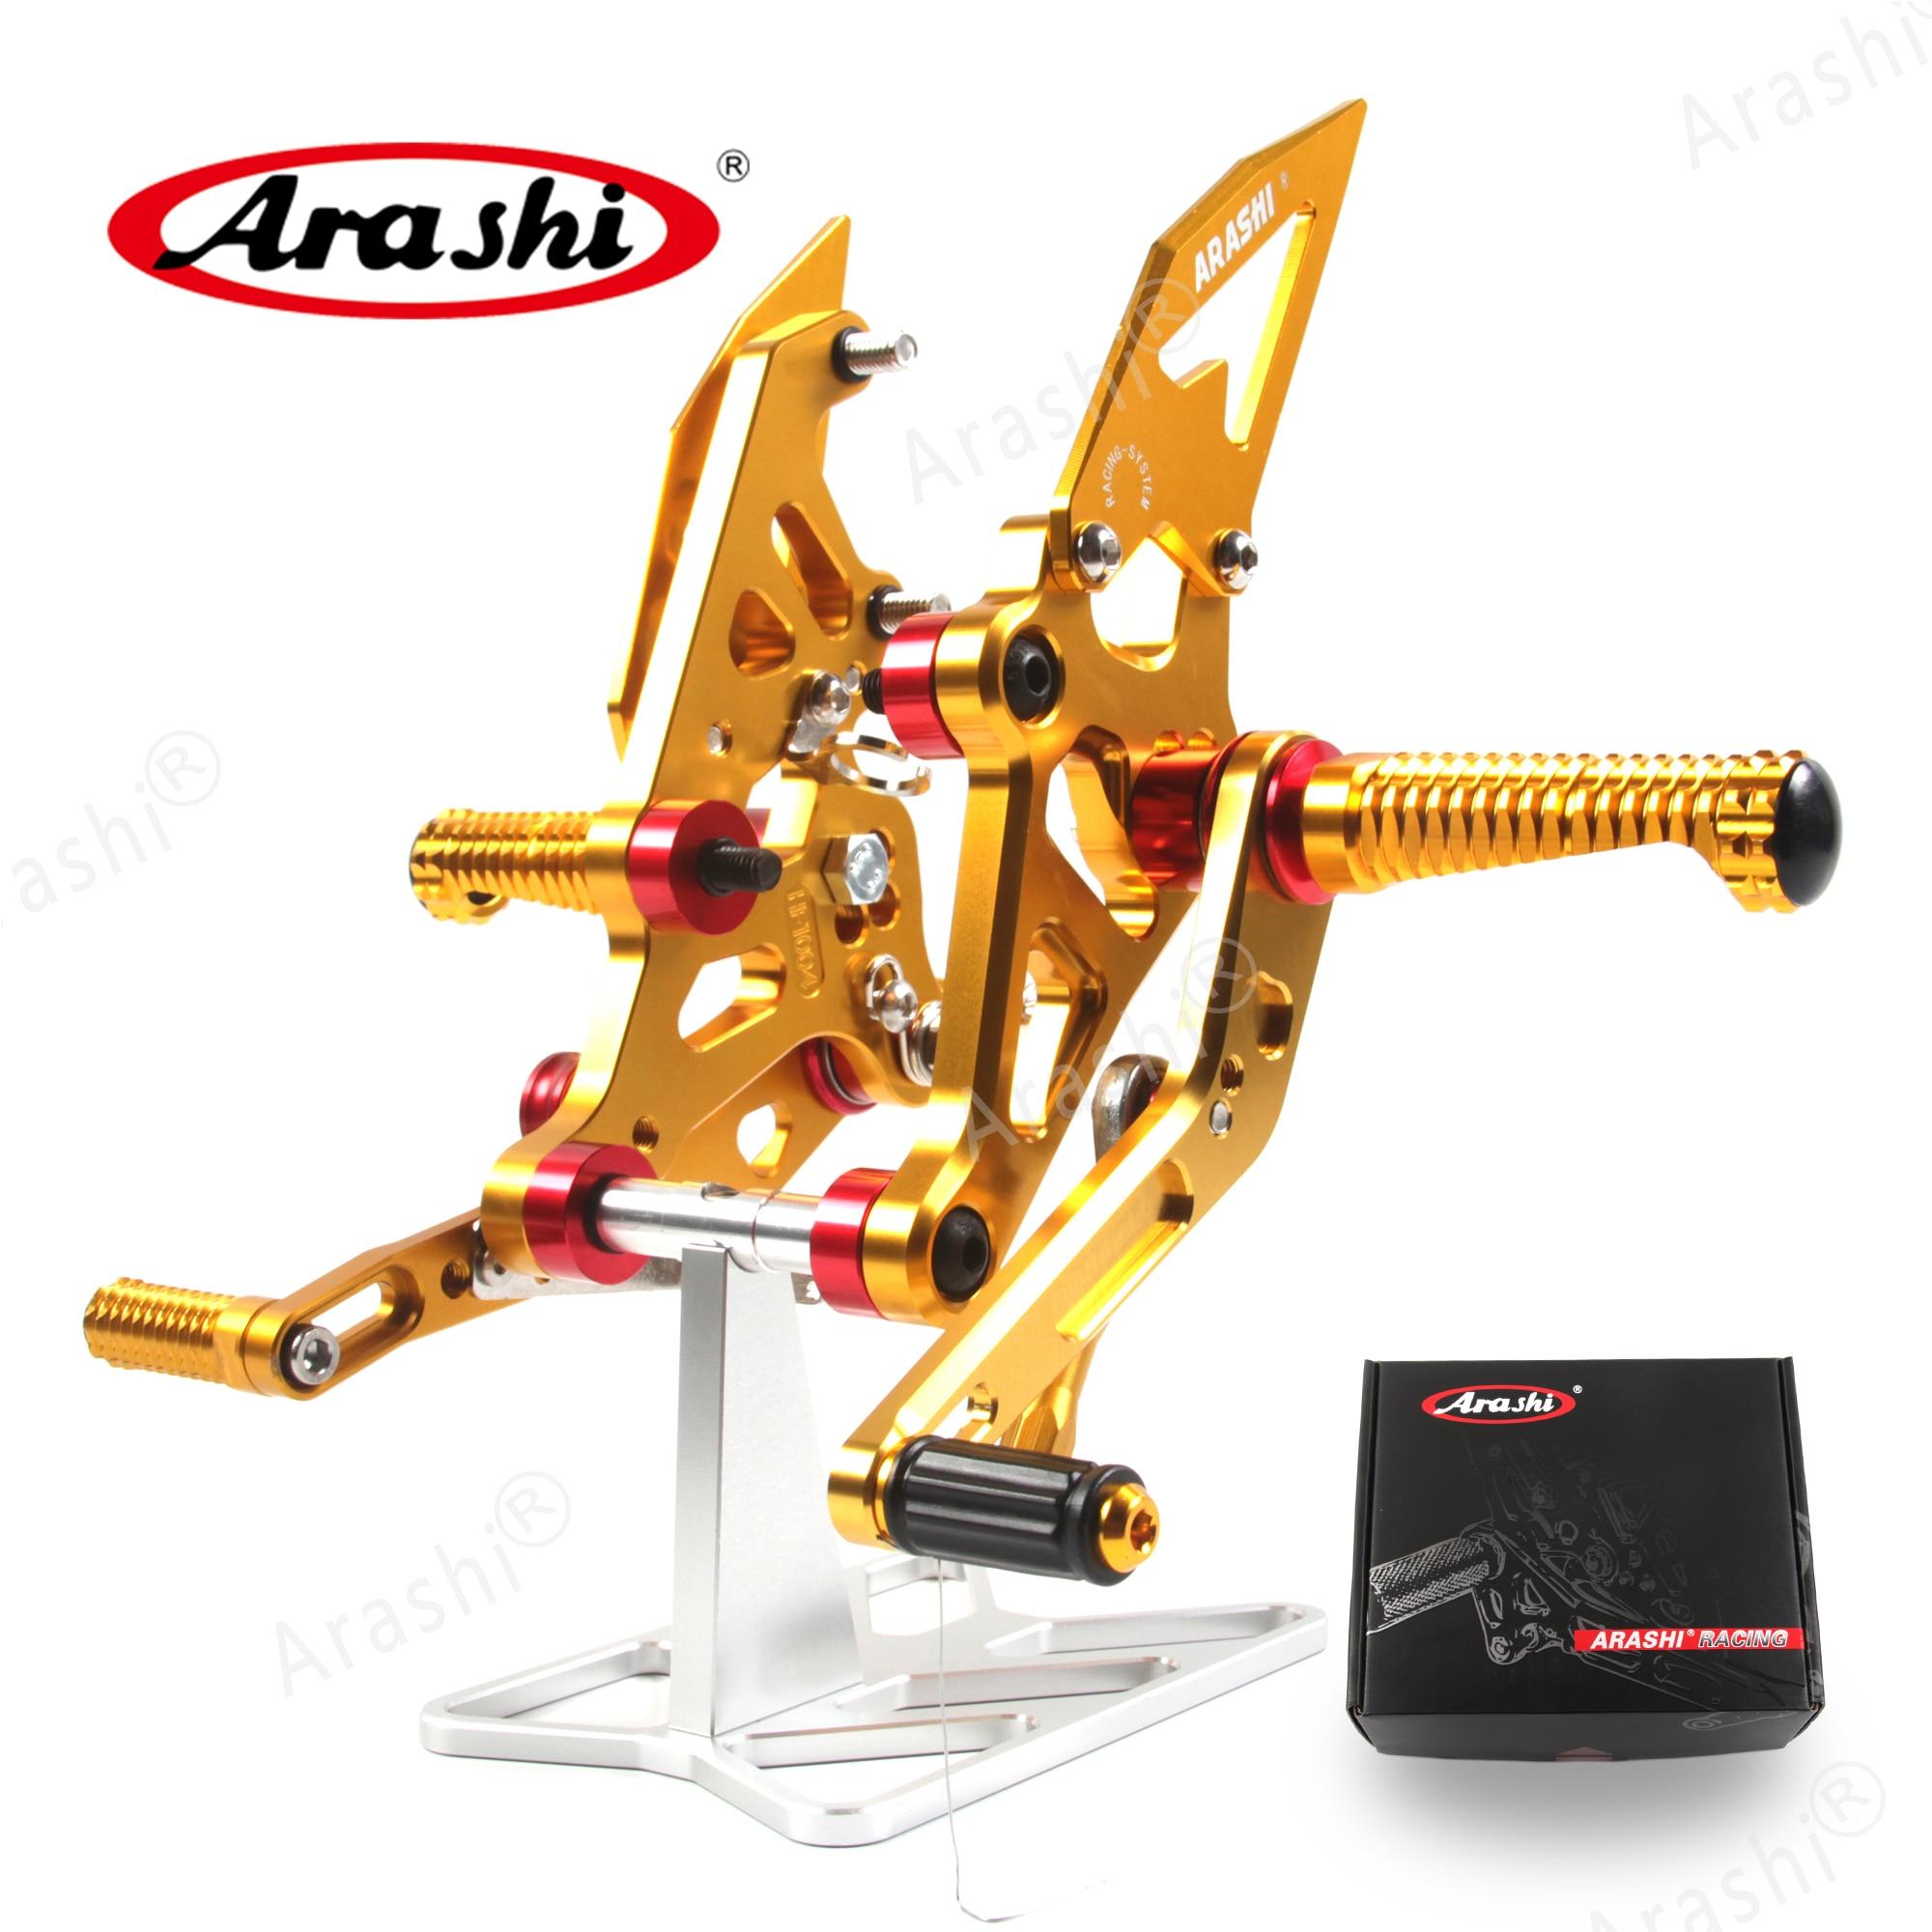 Arashi For YAMAHA MT07 2014-2016 CNC Adjustable Footrest Foot Pegs MT 07 FZ 07 2014 2015 2016 Motorbike Rider Rearset Footrest